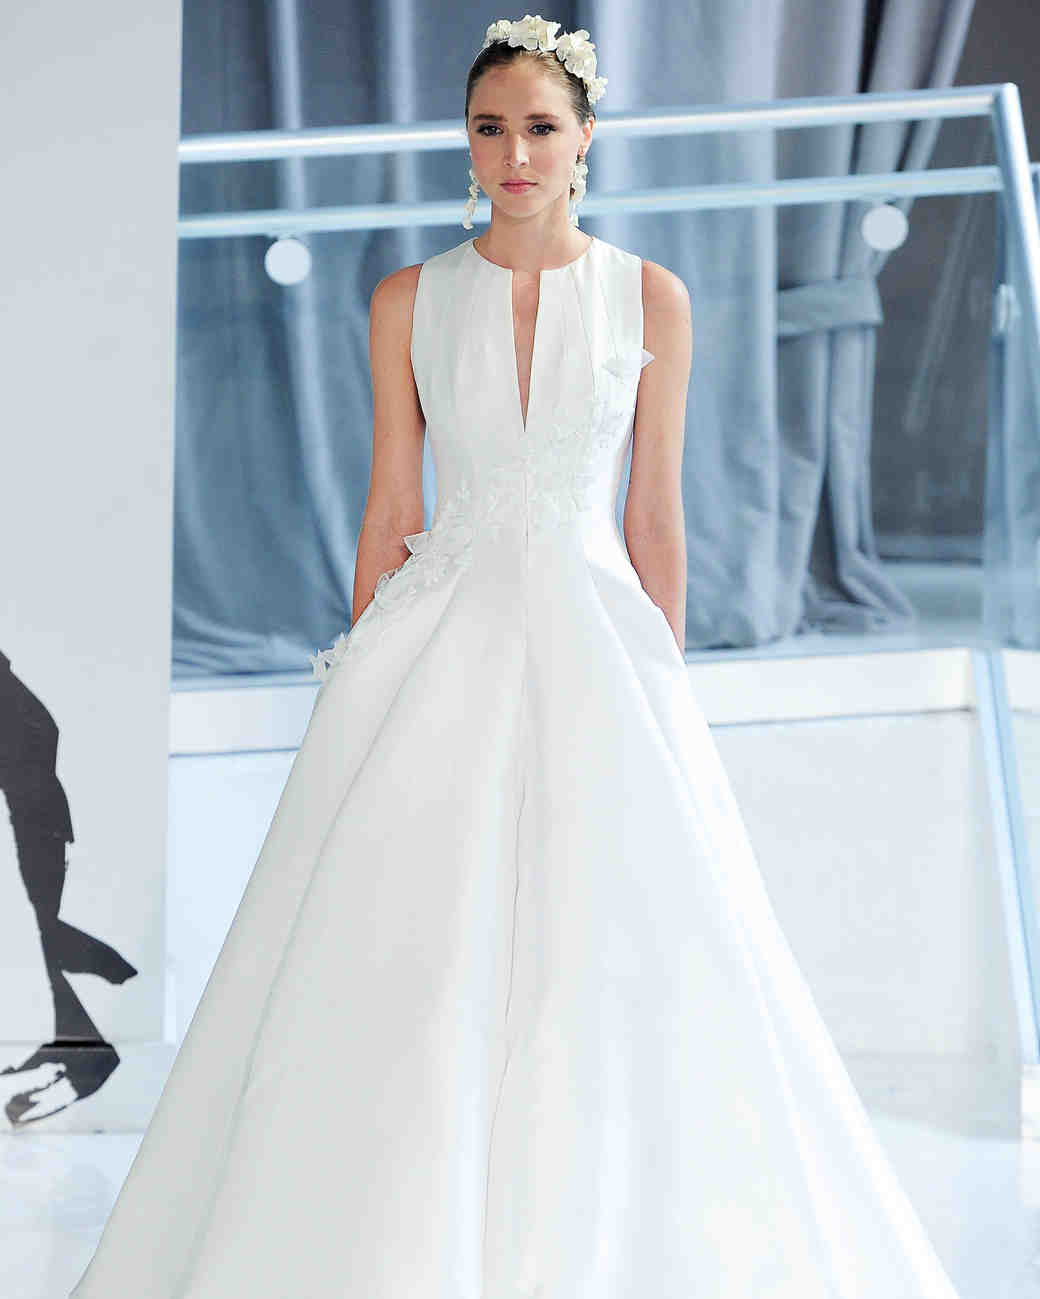 Enchanting Amalia Carrara Wedding Dresses Adornment - All Wedding ...